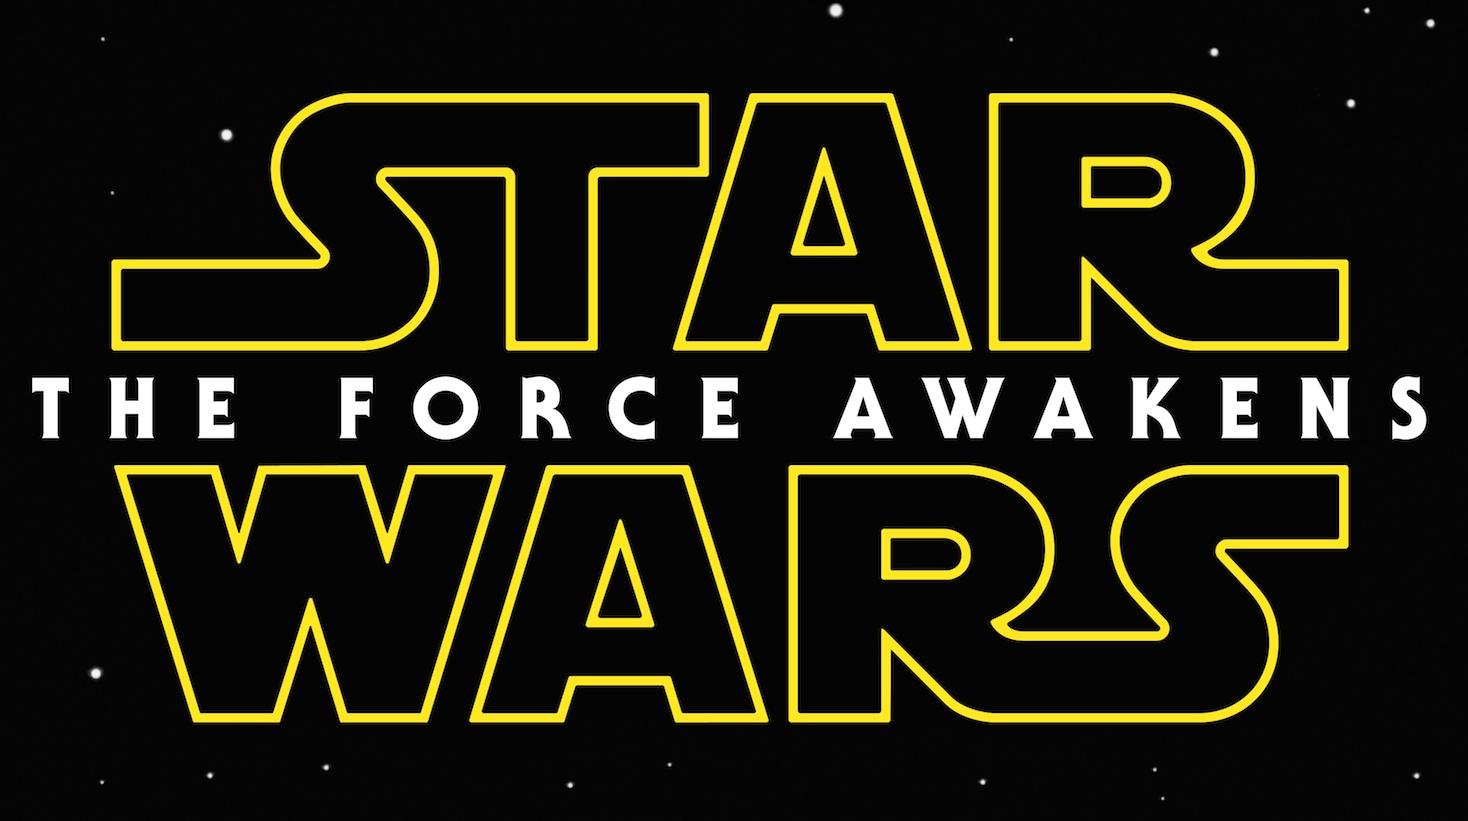 Star_Wars_The_Force_Awakens-1.jpg